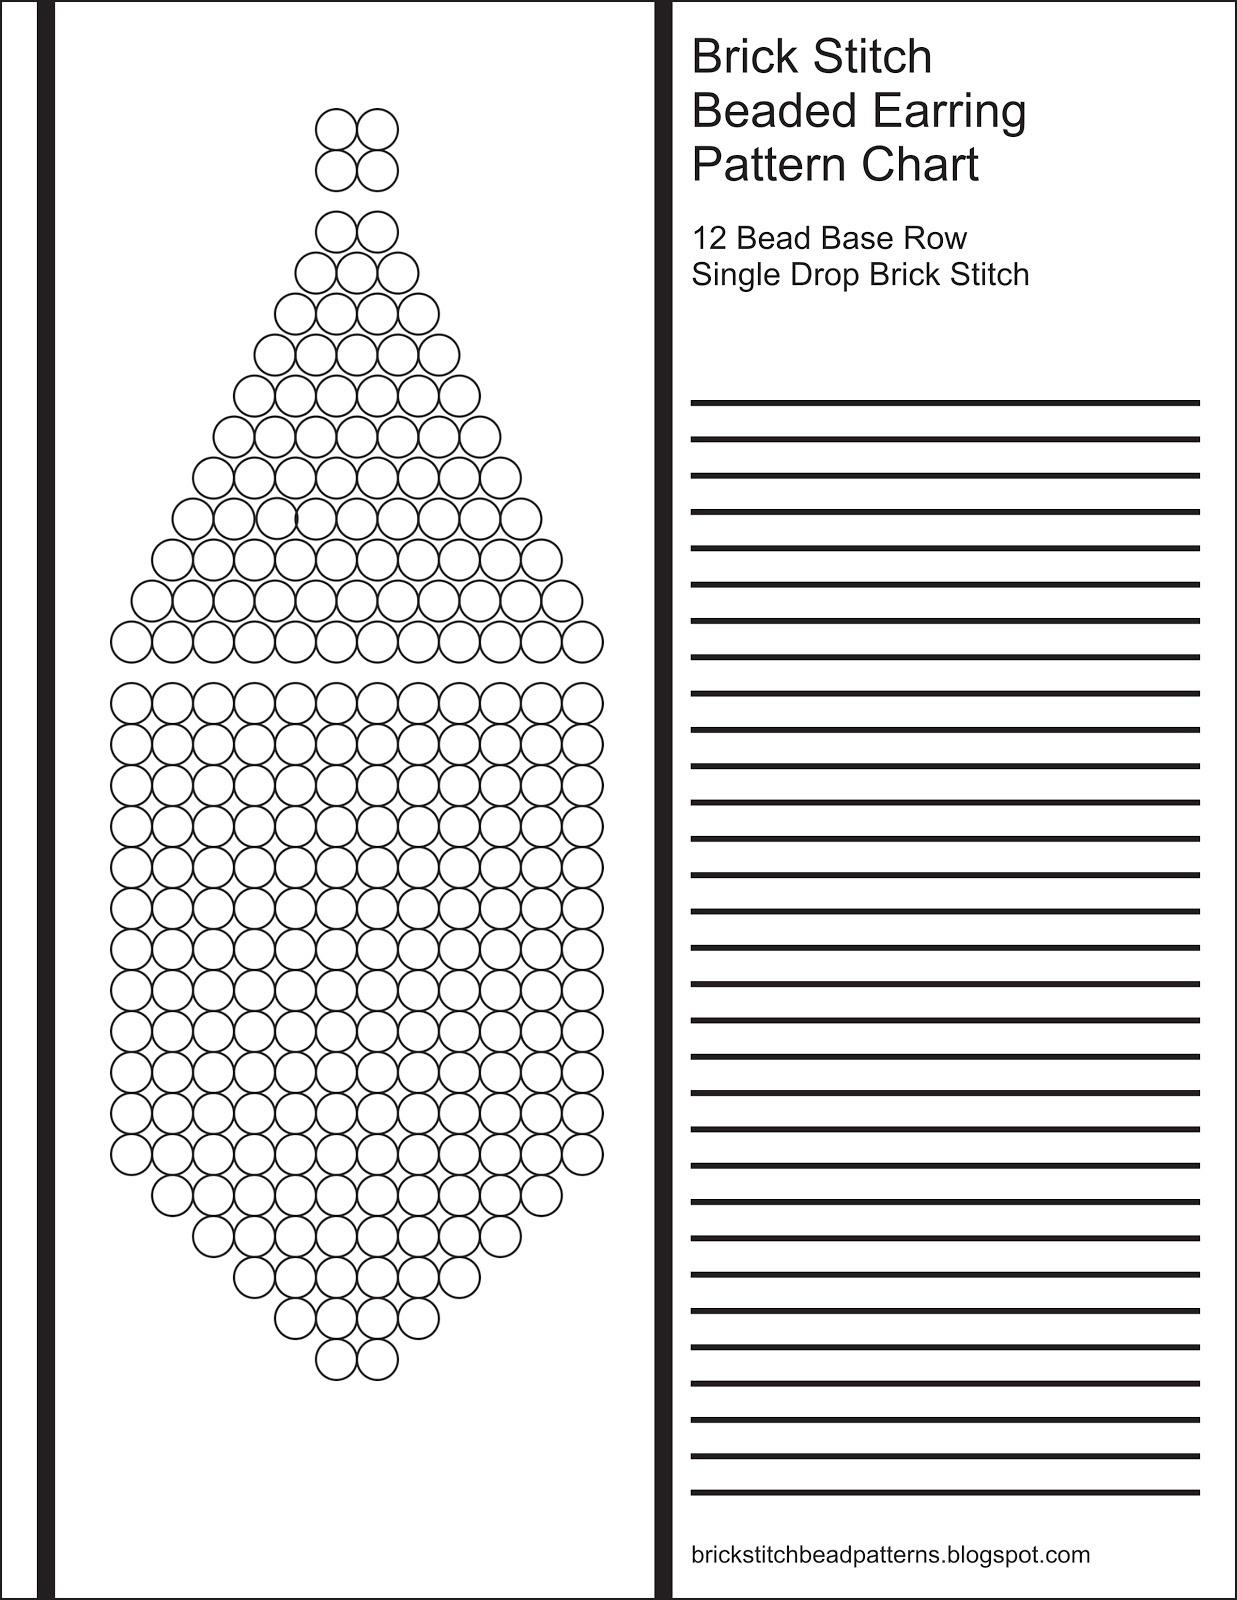 Brick Stitch Bead Patterns Journal: 12 Bead Base Row Blank Round - Free Printable Native American Beading Patterns